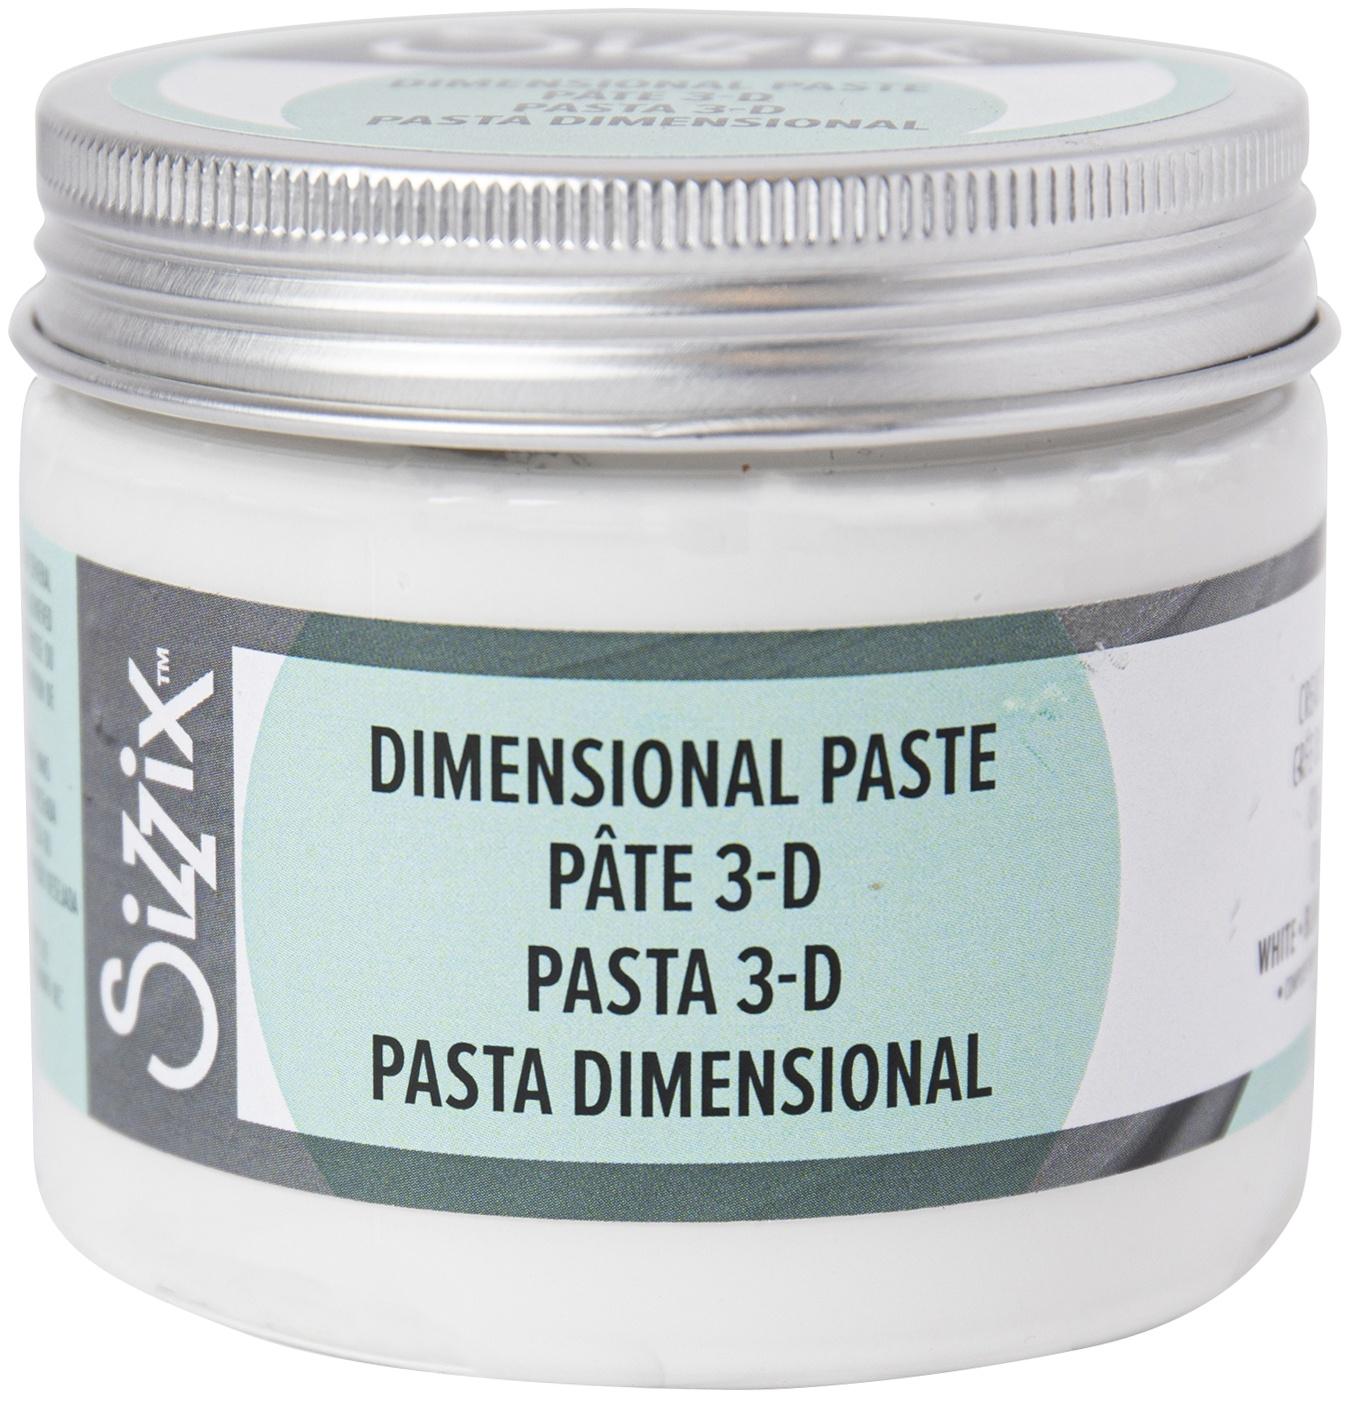 Sizzix Effectz Dimentional Paste -White